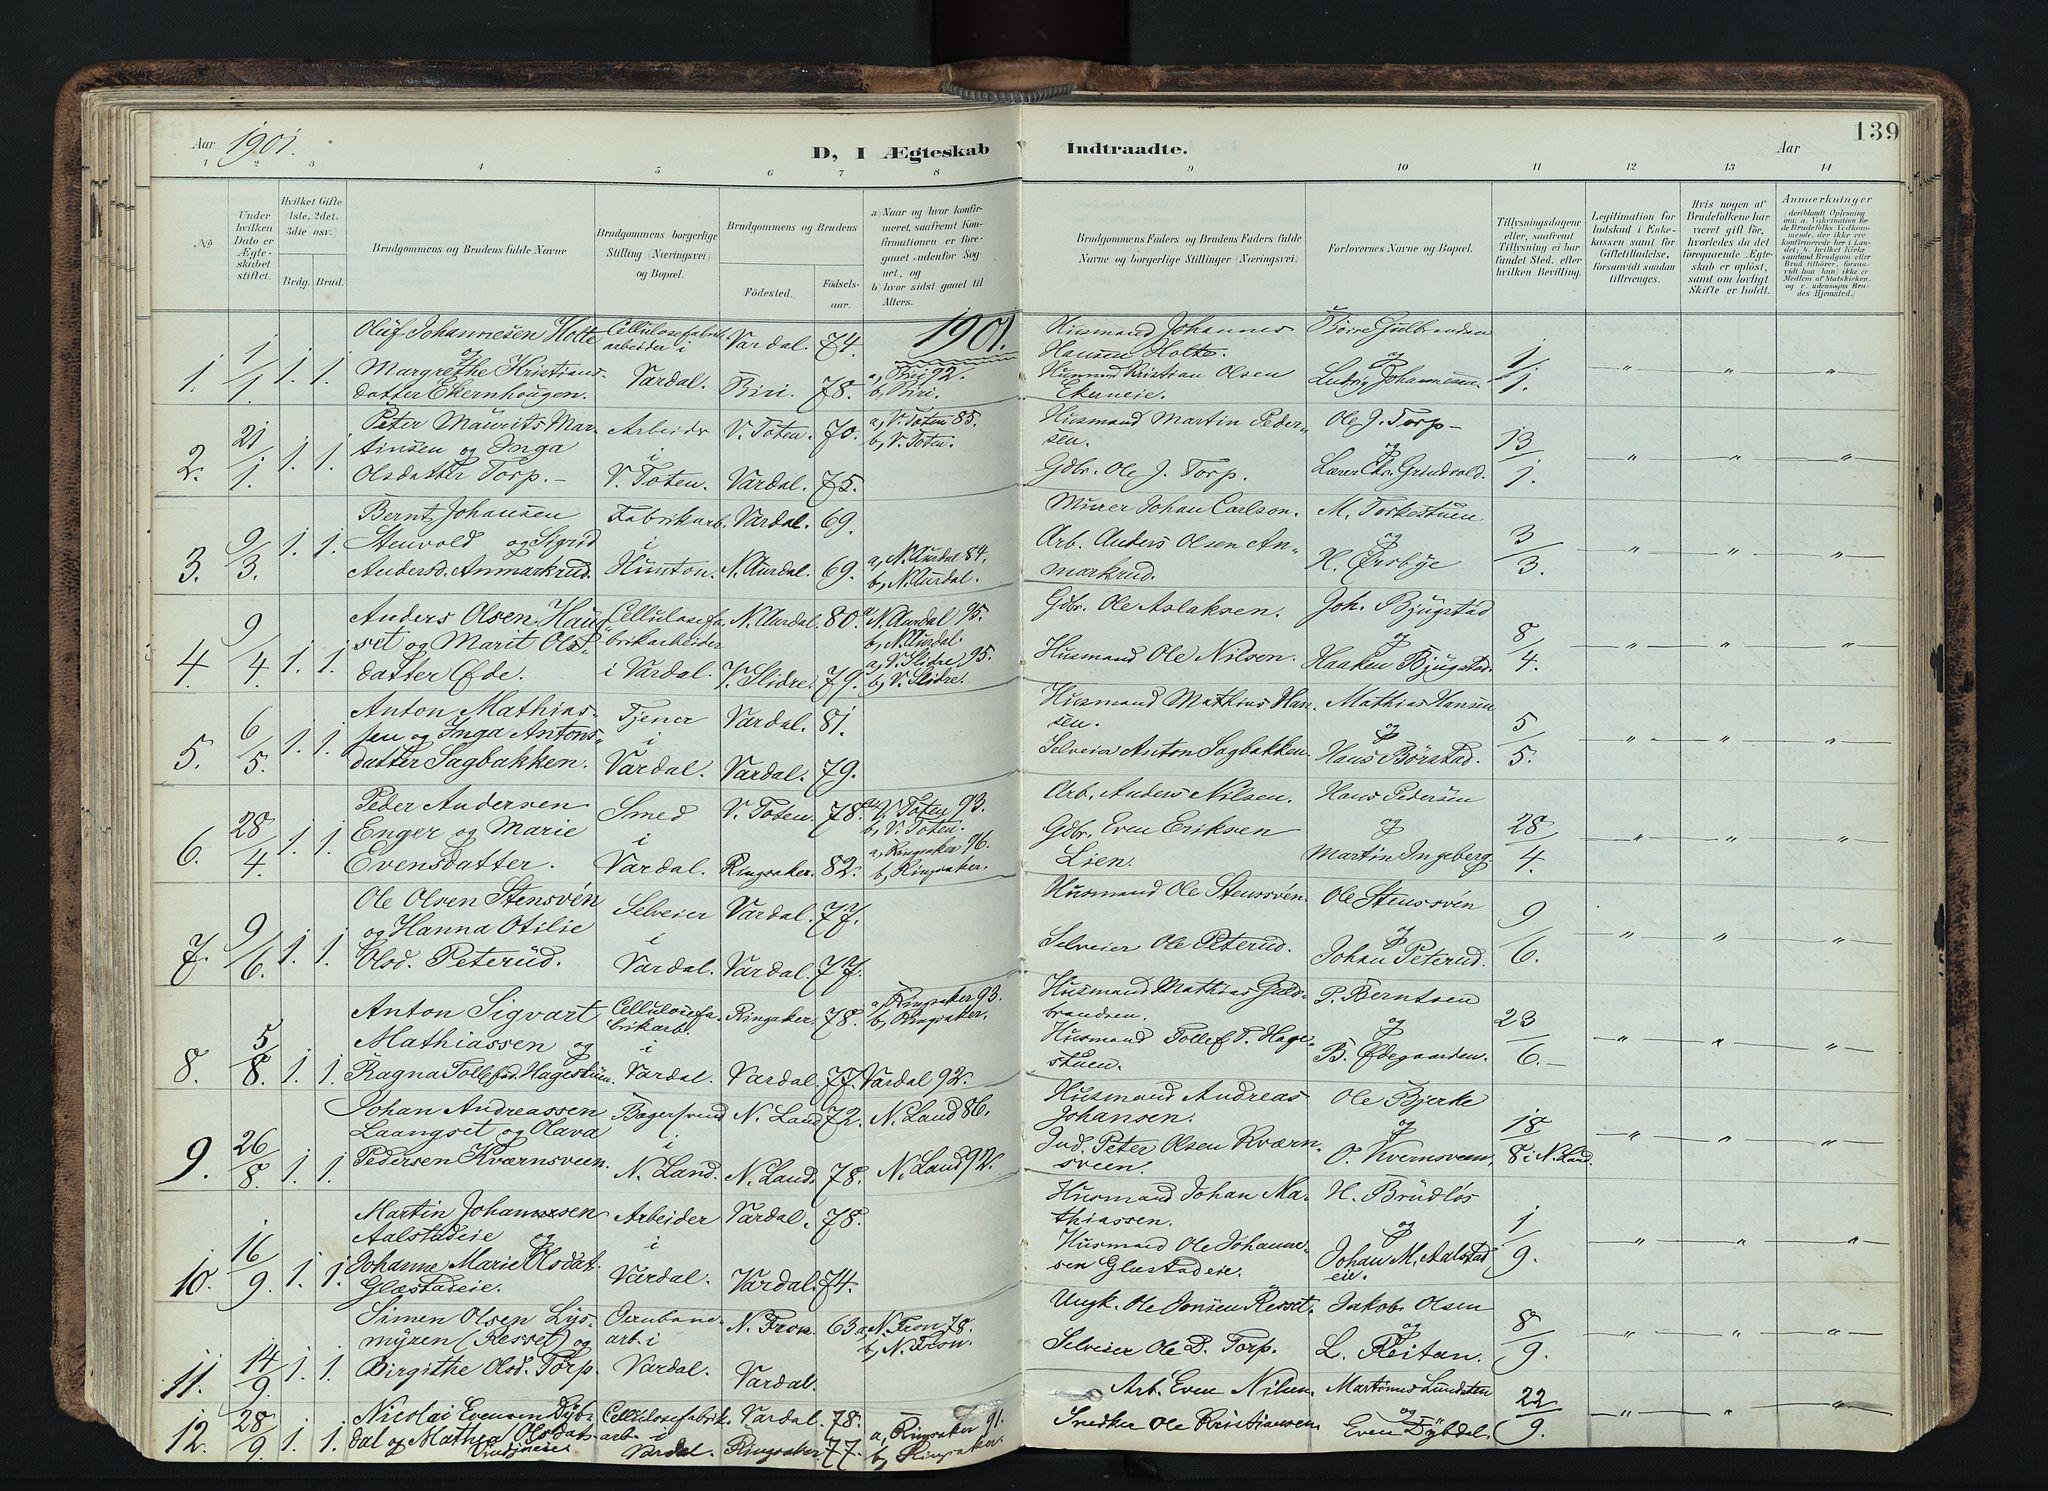 SAH, Vardal prestekontor, H/Ha/Haa/L0019: Ministerialbok nr. 19, 1893-1907, s. 139